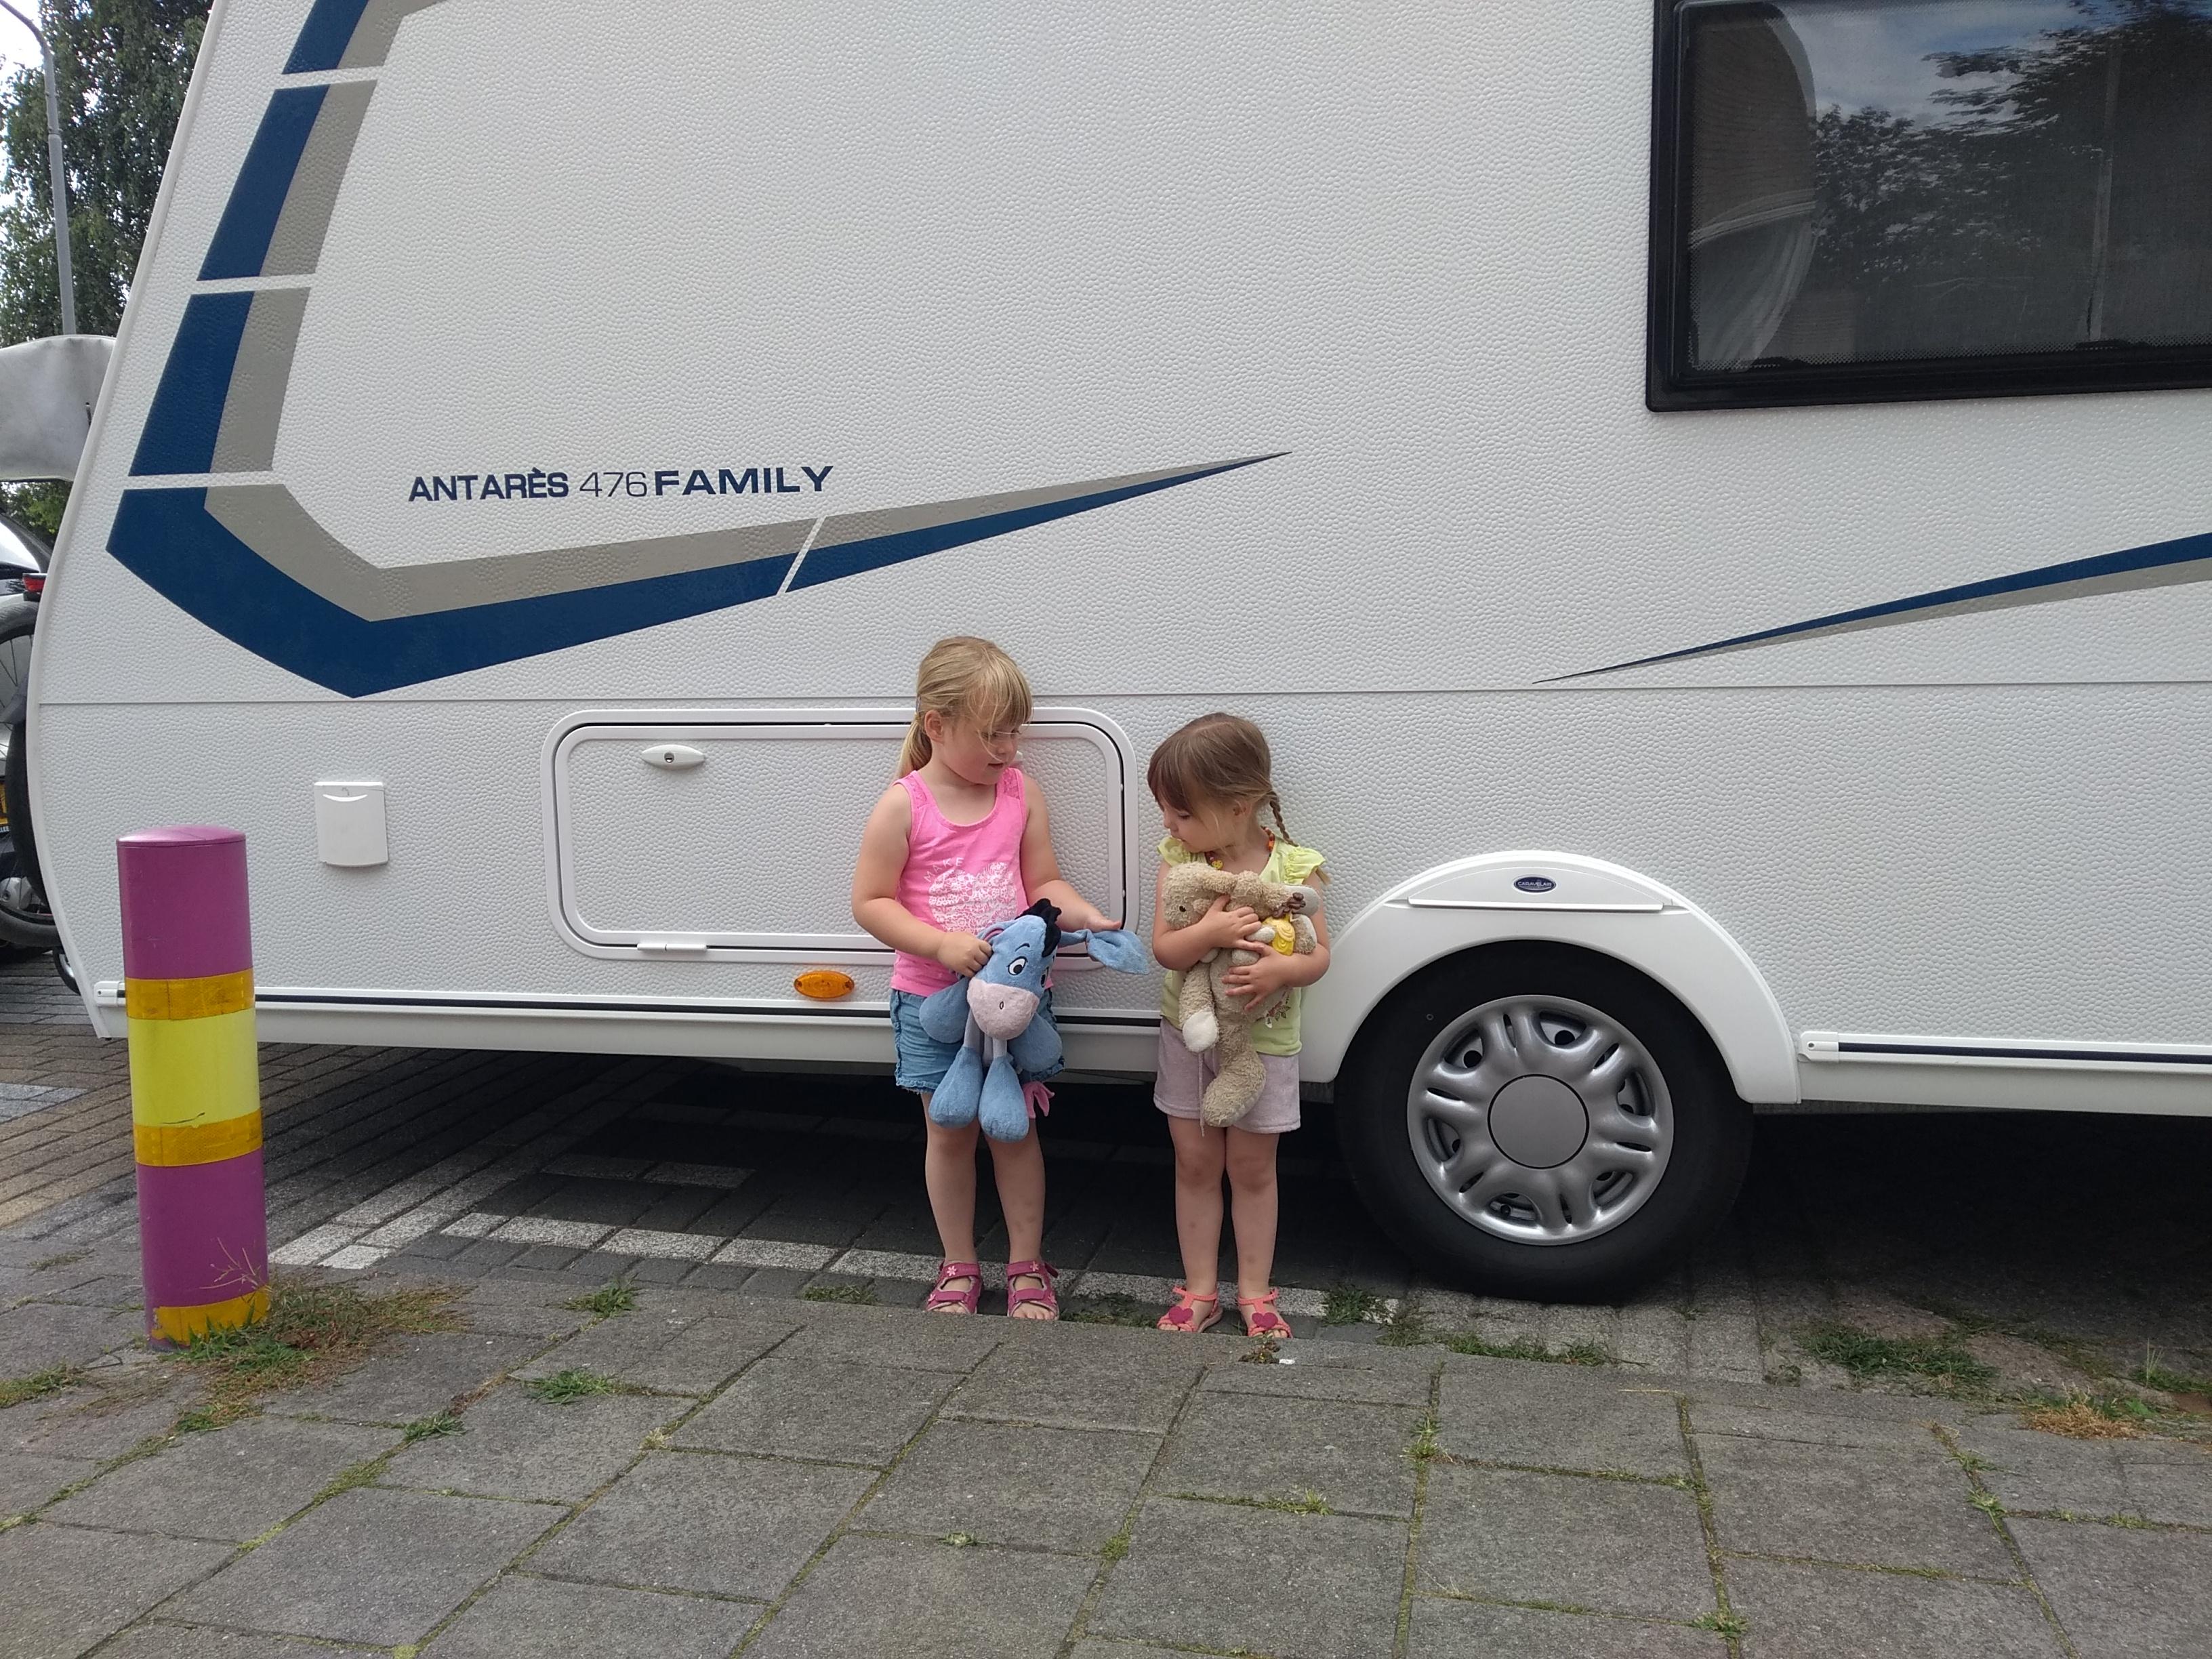 sprookjescamping, kindercaming, Sprookjescamping de Vechtstreek, kamperen, camping, kindervakantie, zomervakantie, gezinsvakantie, plog, mamalifestyle, mamablog, blog, lalog.nl, lalogblog, lalog